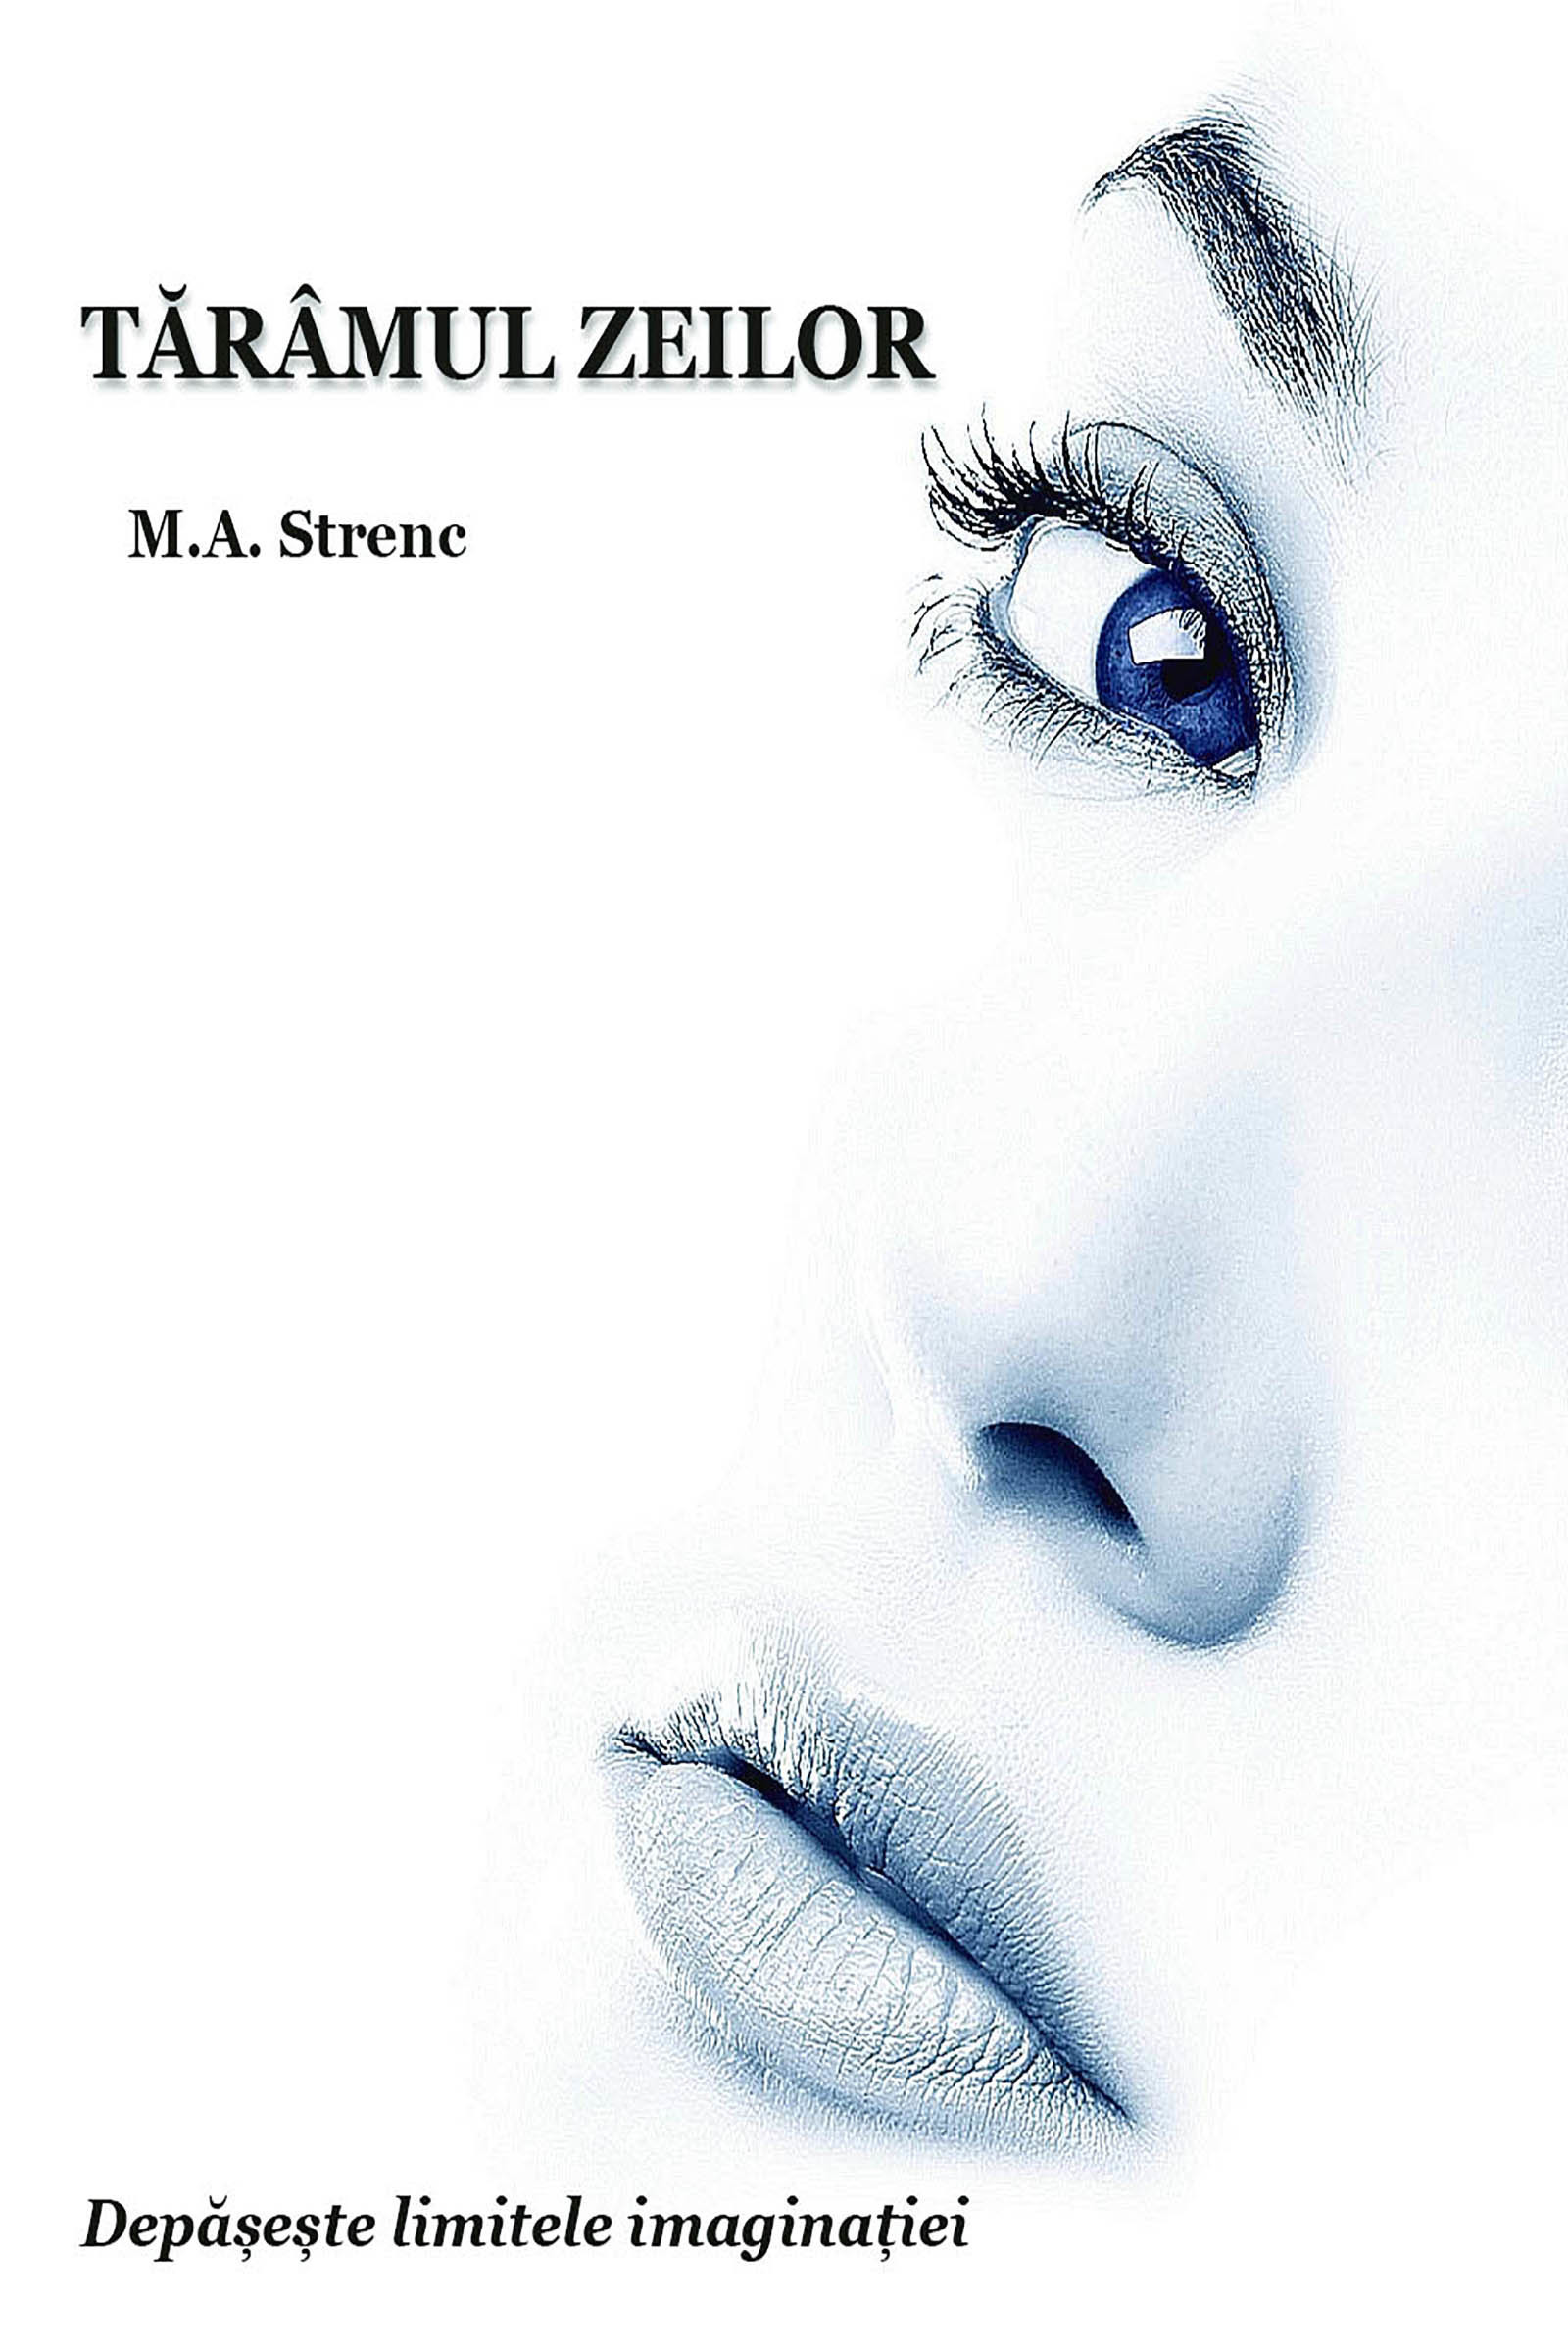 Tărâmul Zeilor  by  M. A. Strenc